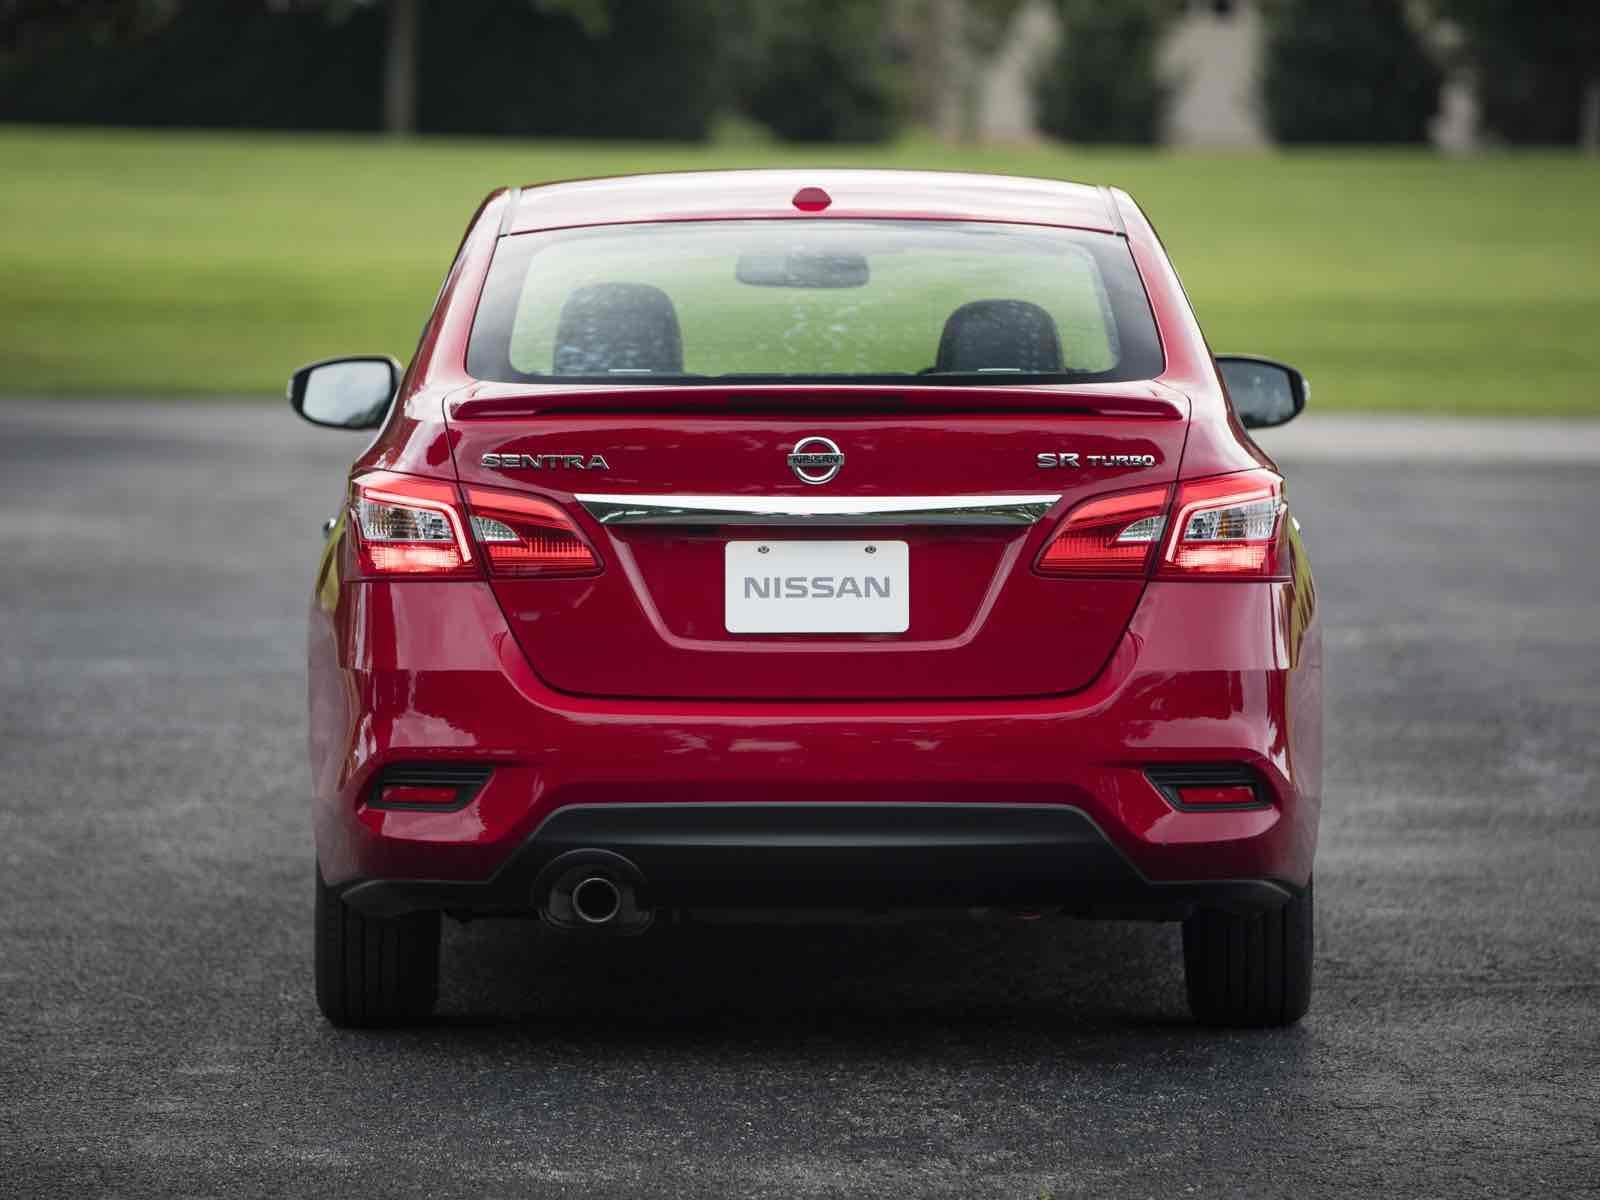 Nissan Sentra Sr Turbo 2017 Llega A M 233 Xico Desde 344 700